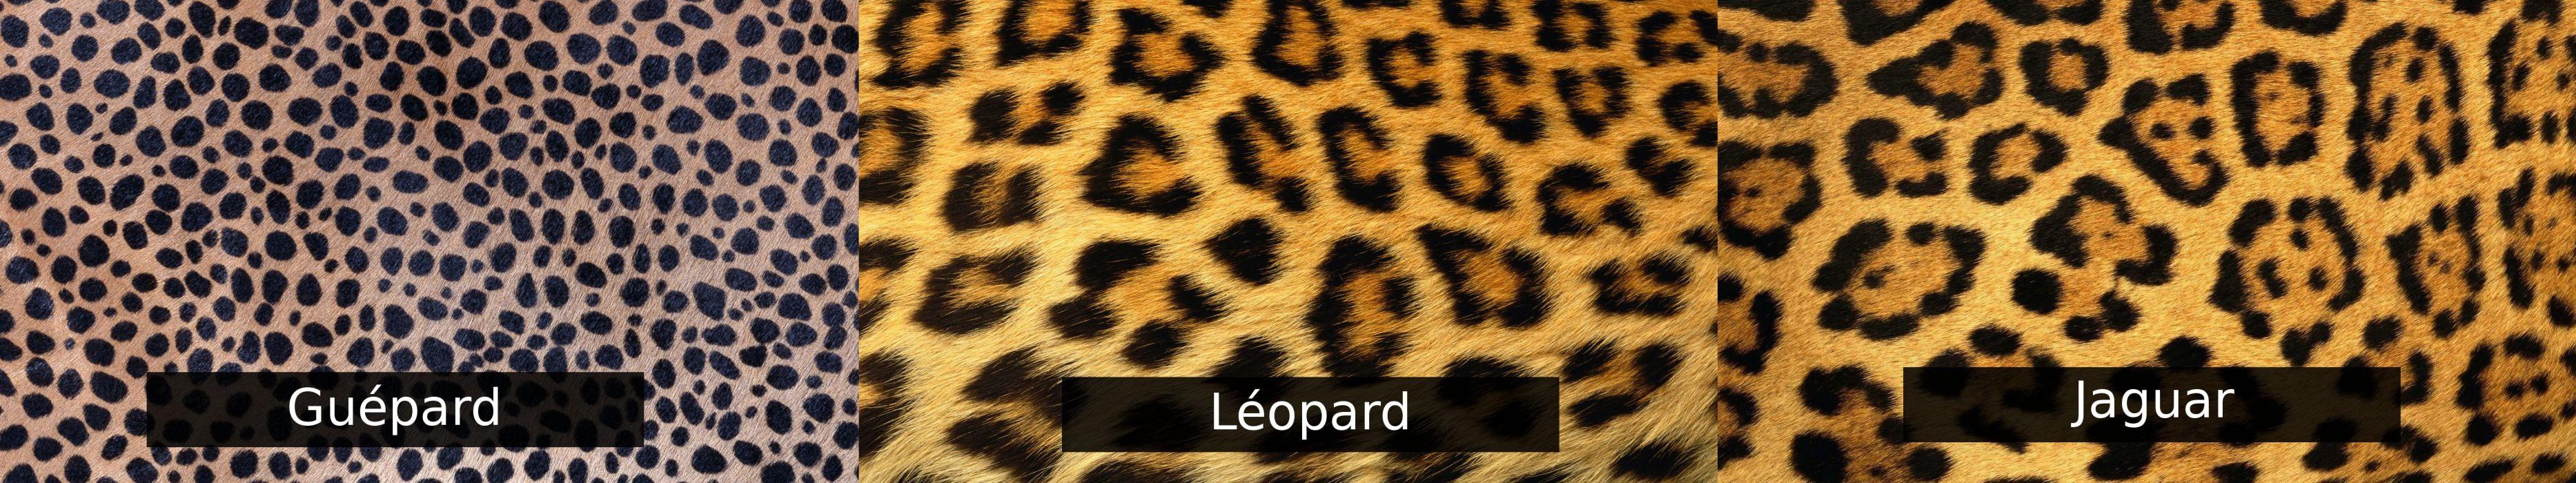 wallpaper triple multi multiple monitor screen leopard jaguar gepard cheetah wallpaper